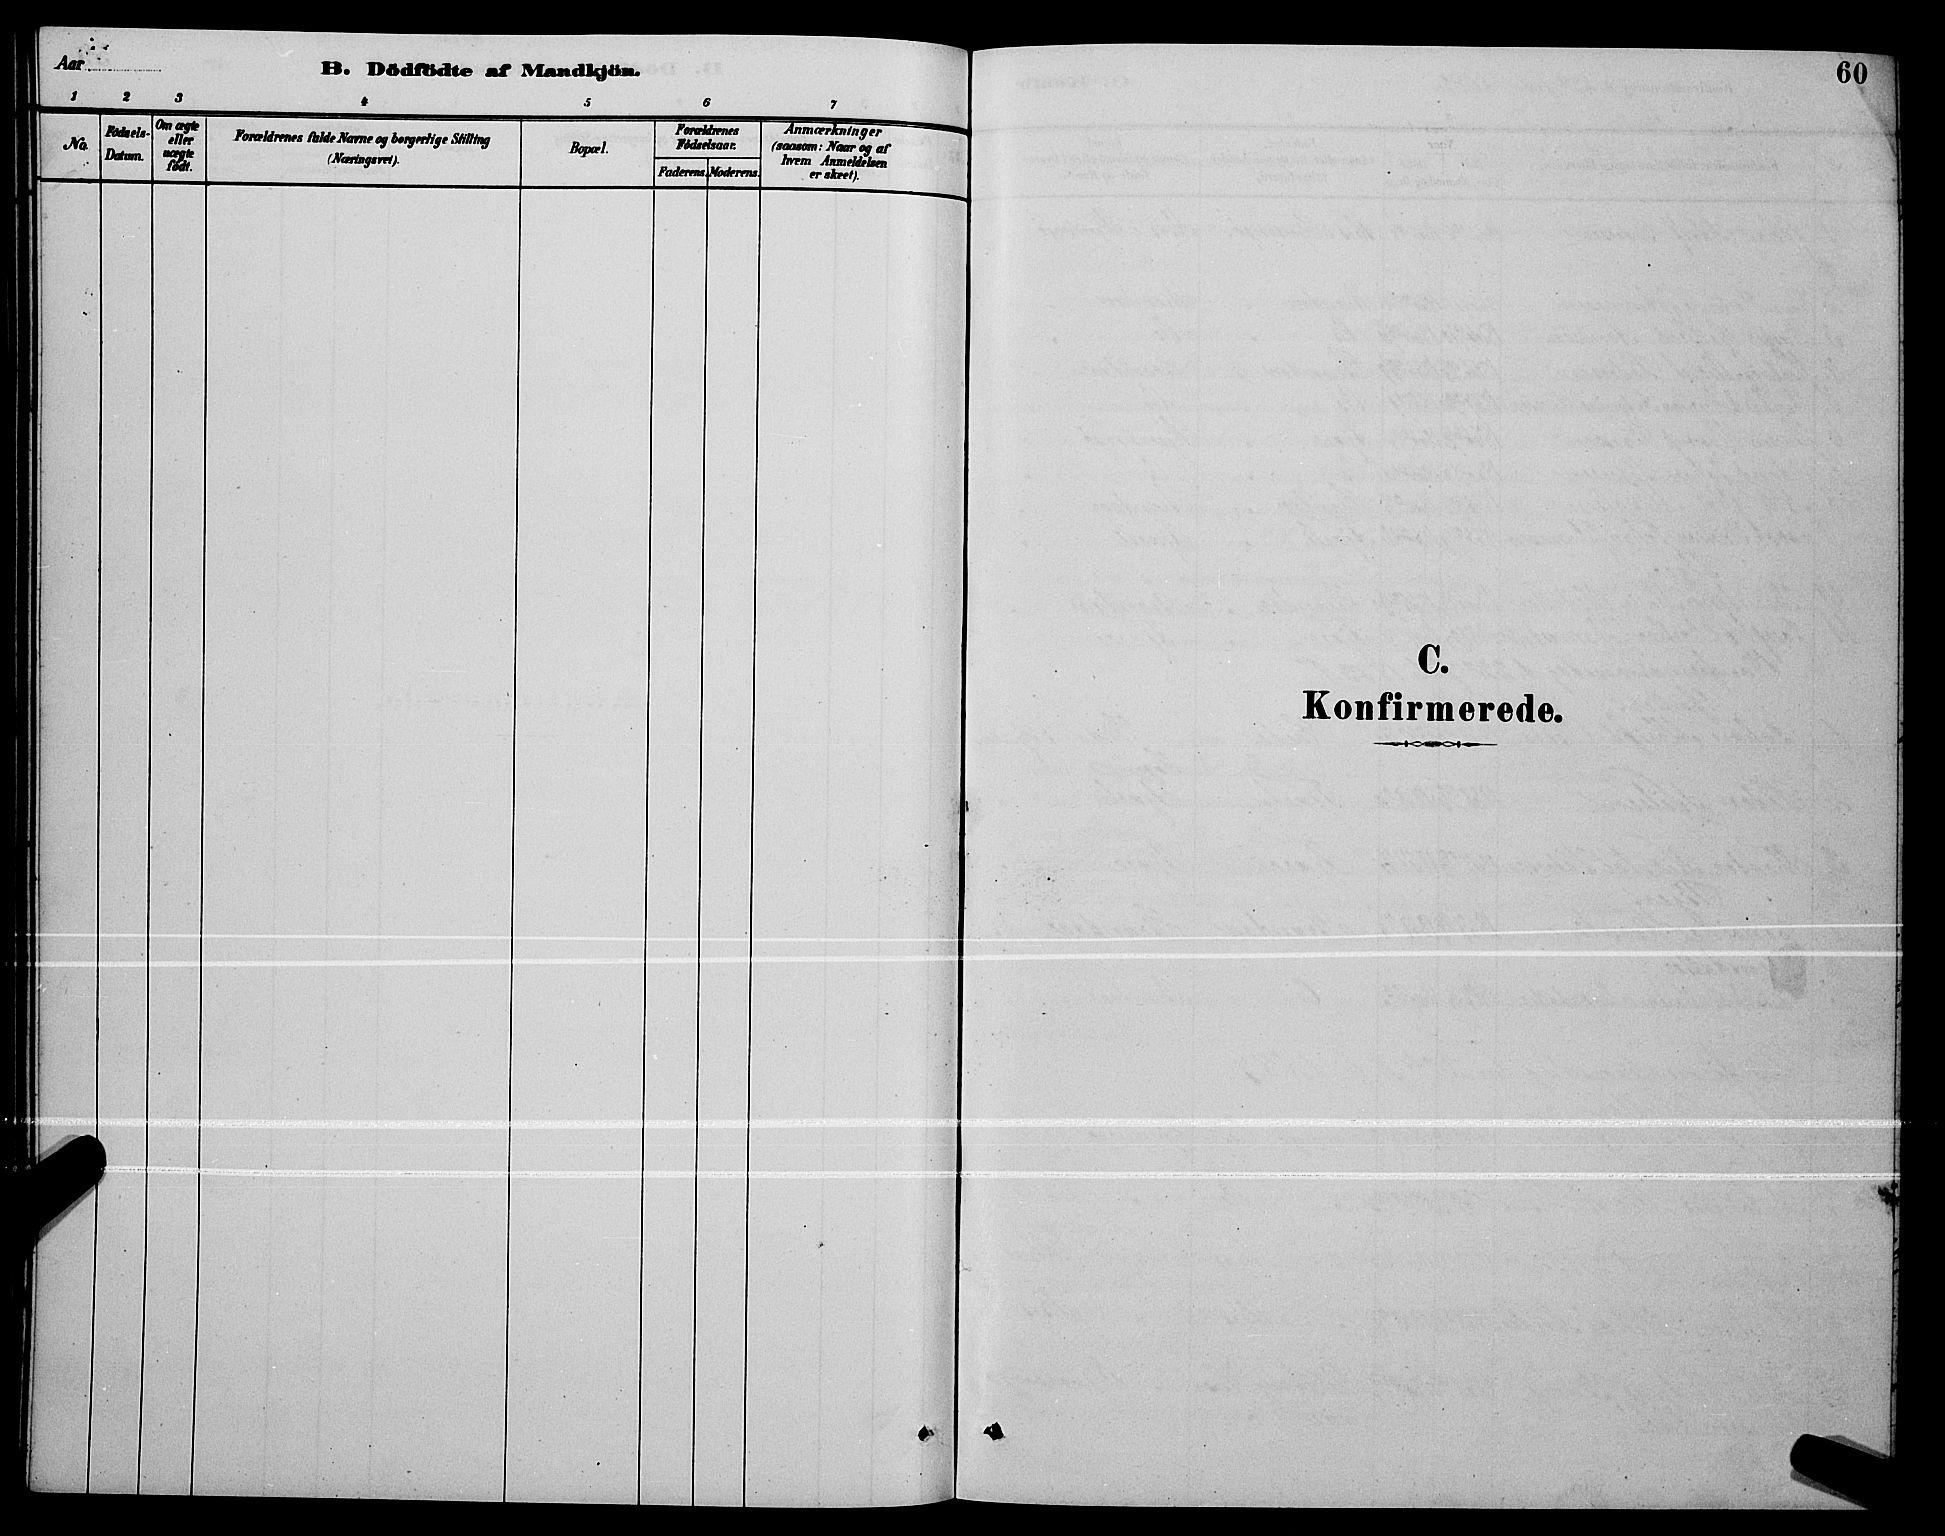 SAT, Ministerialprotokoller, klokkerbøker og fødselsregistre - Nordland, 803/L0076: Klokkerbok nr. 803C03, 1882-1897, s. 60